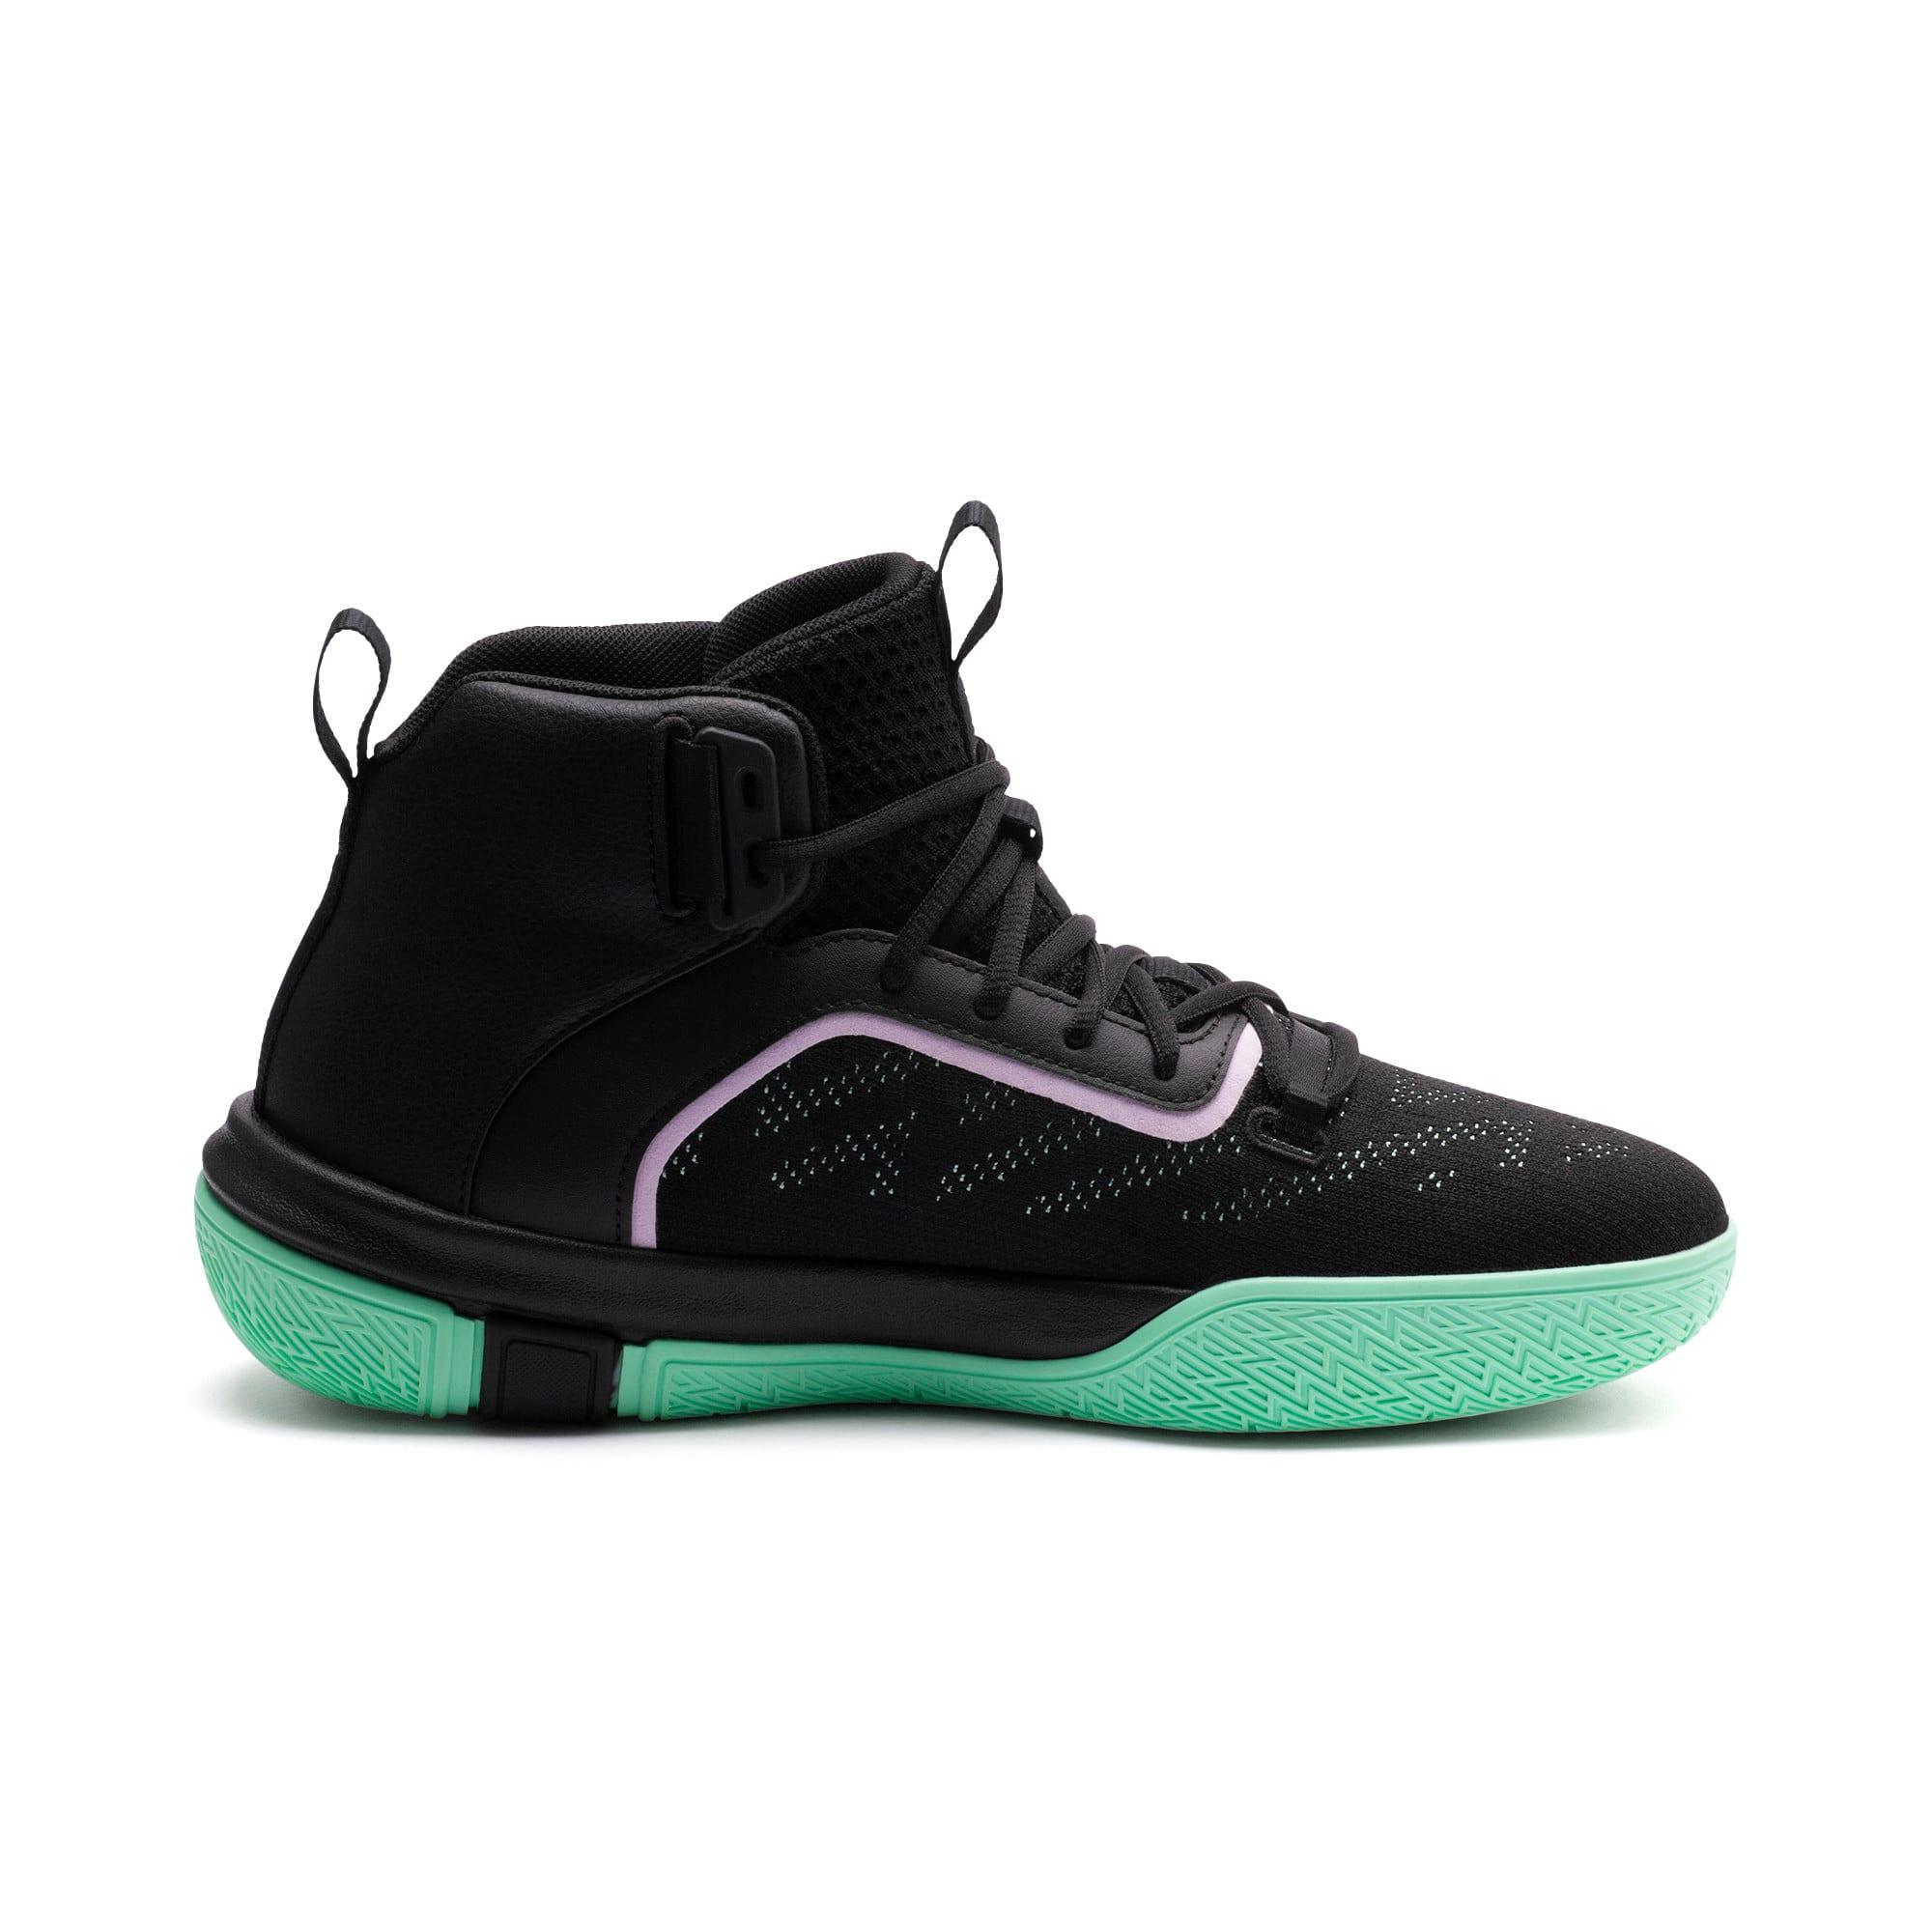 Anteprima 5 di Legacy Dark Mode Basketball Shoes, Puma Black-Orchid Bloom, medio